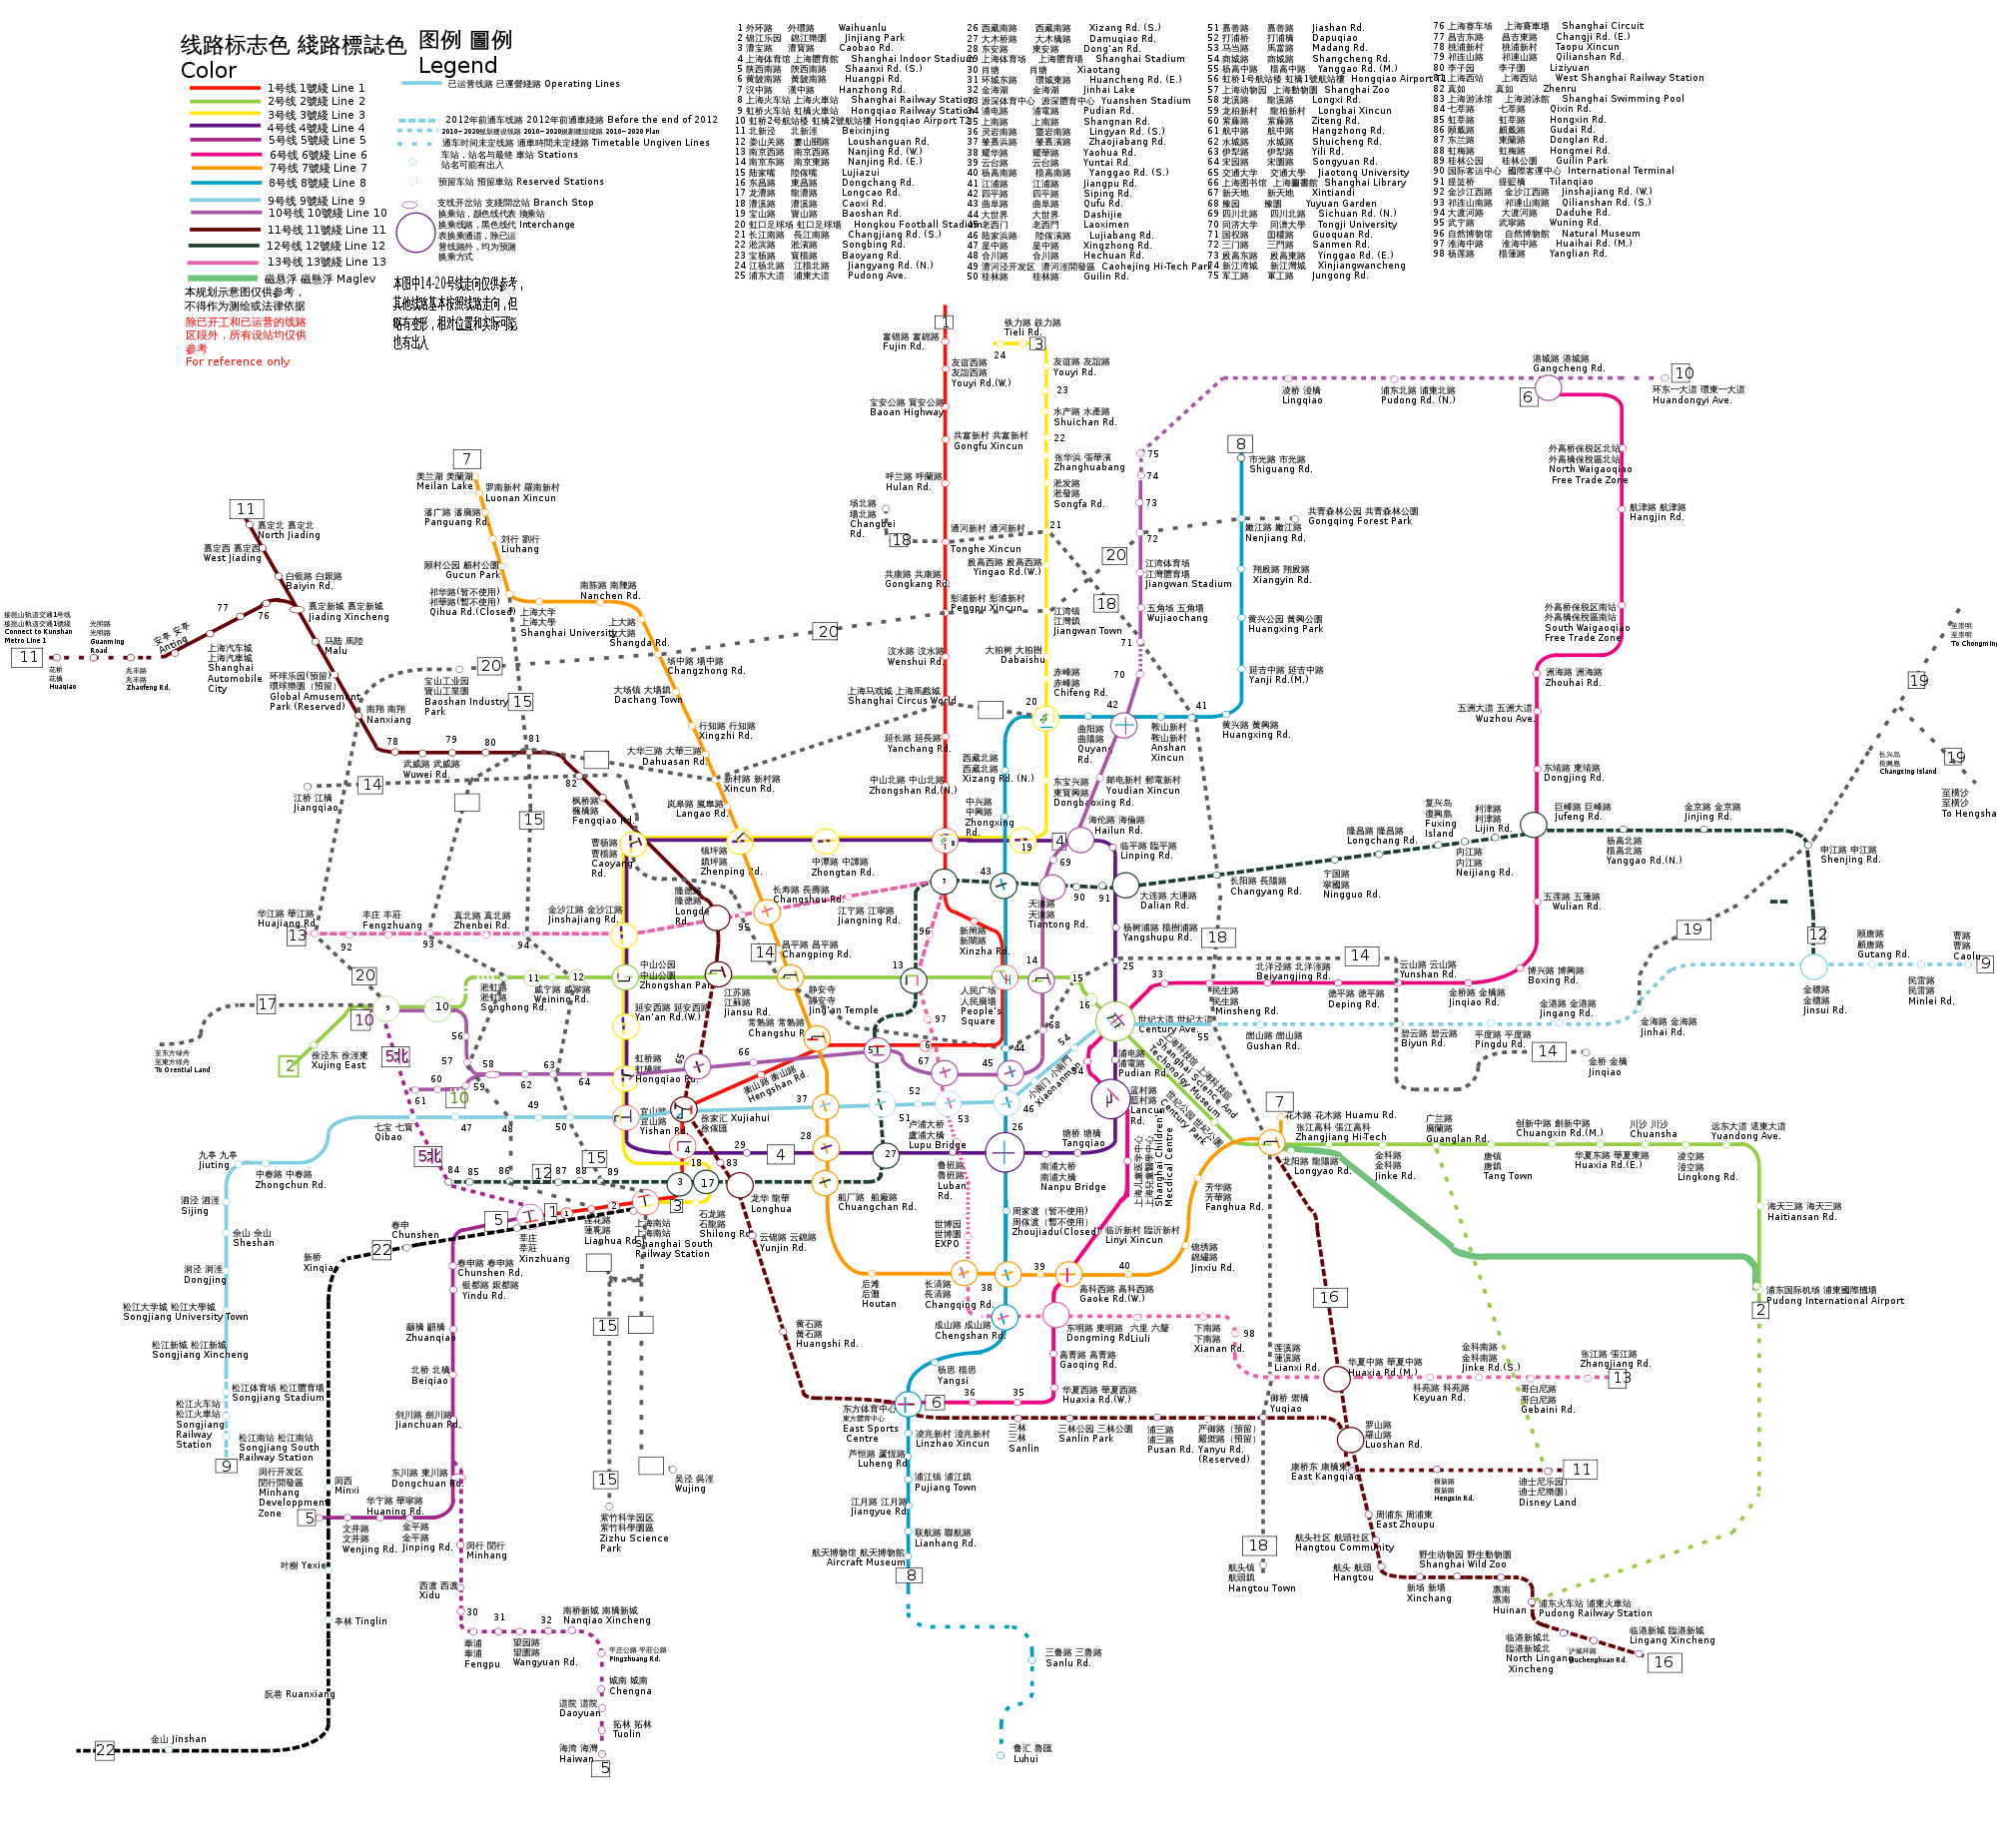 Ausbau der Metro Shanghai bis 2020